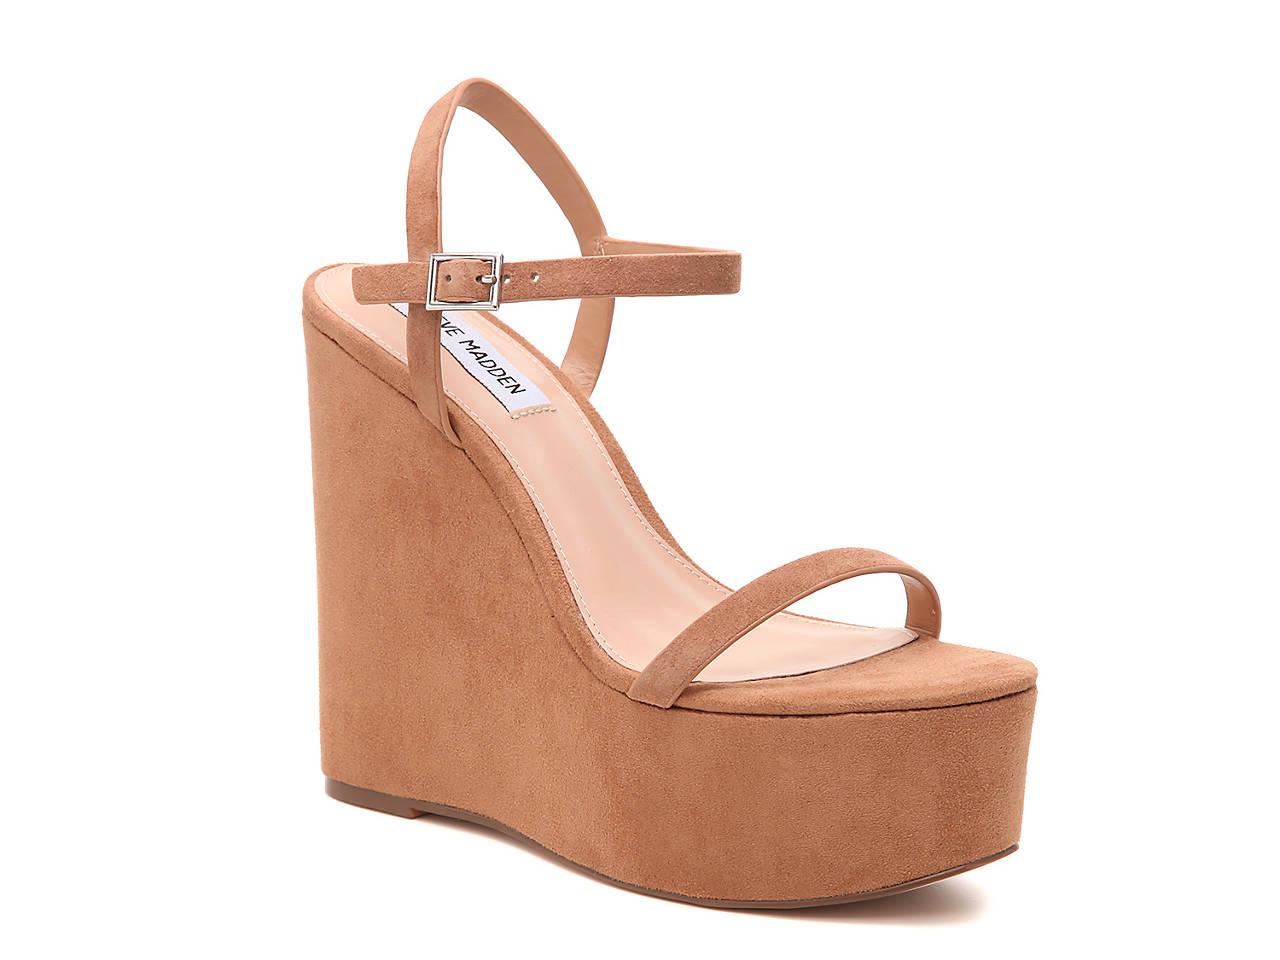 9dbe10827a7 Baxlie Wedge Sandal